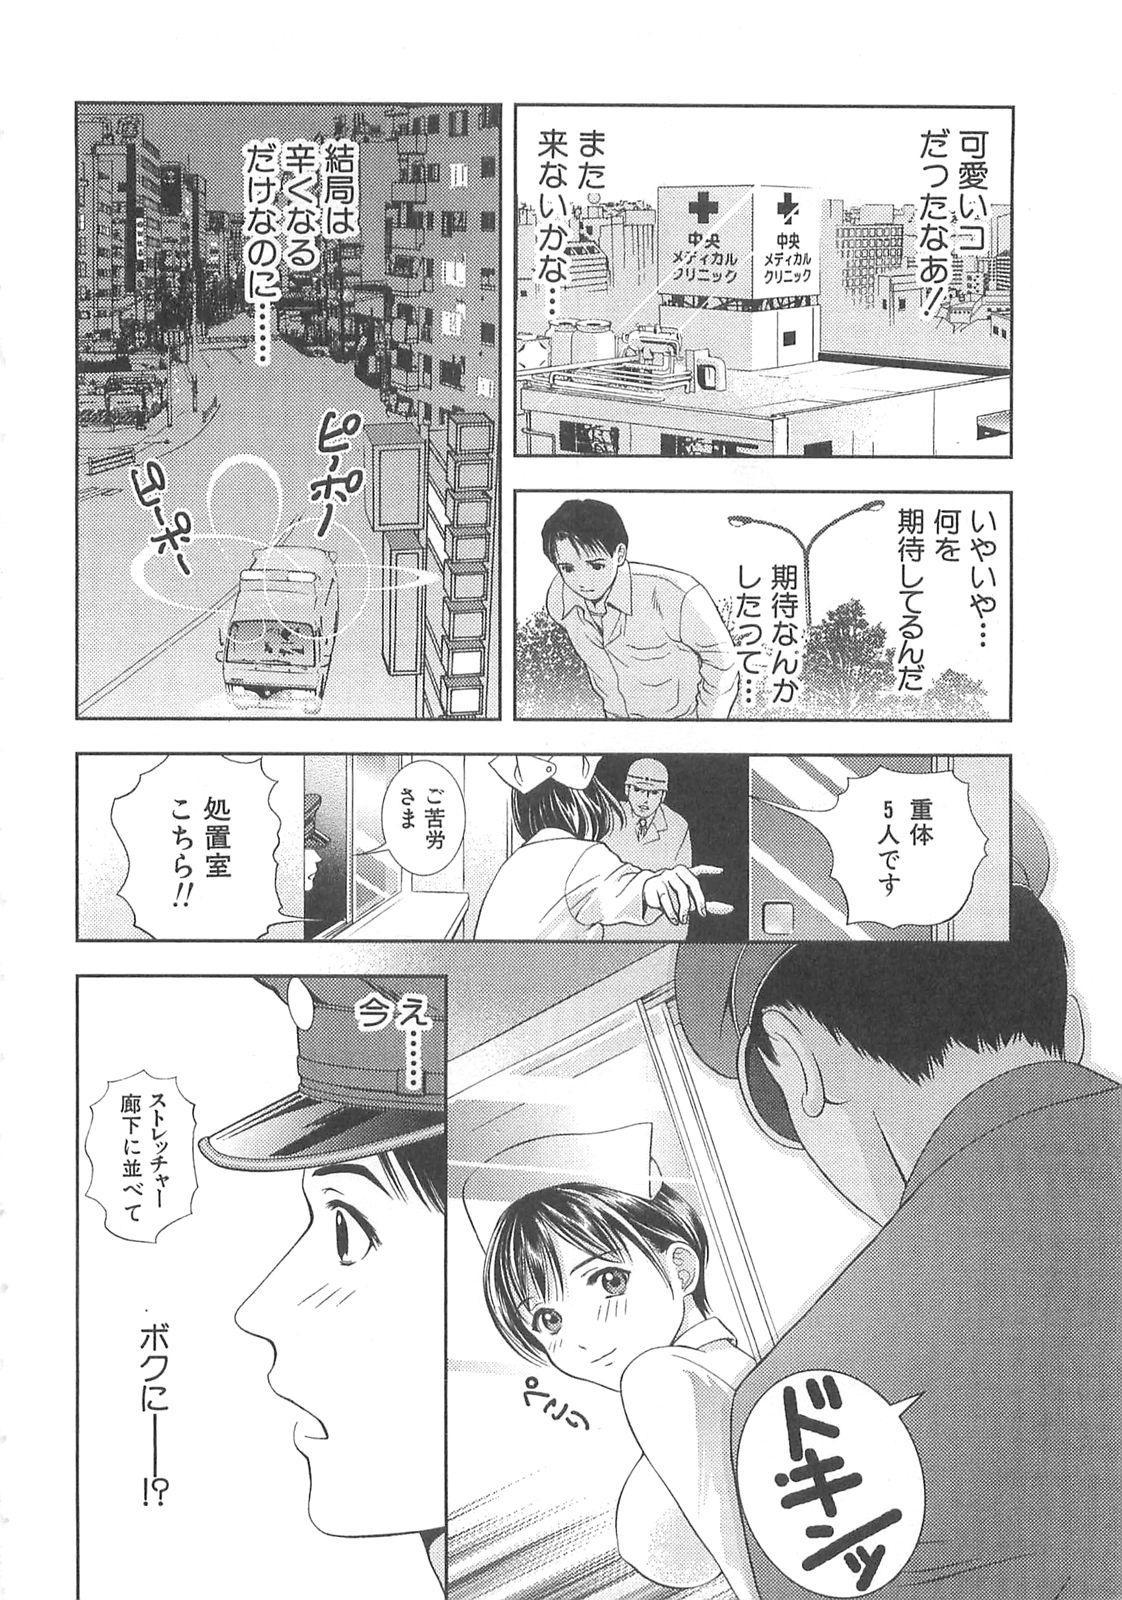 Tenshi no Kyuu - Angel's Pretty Hip 90